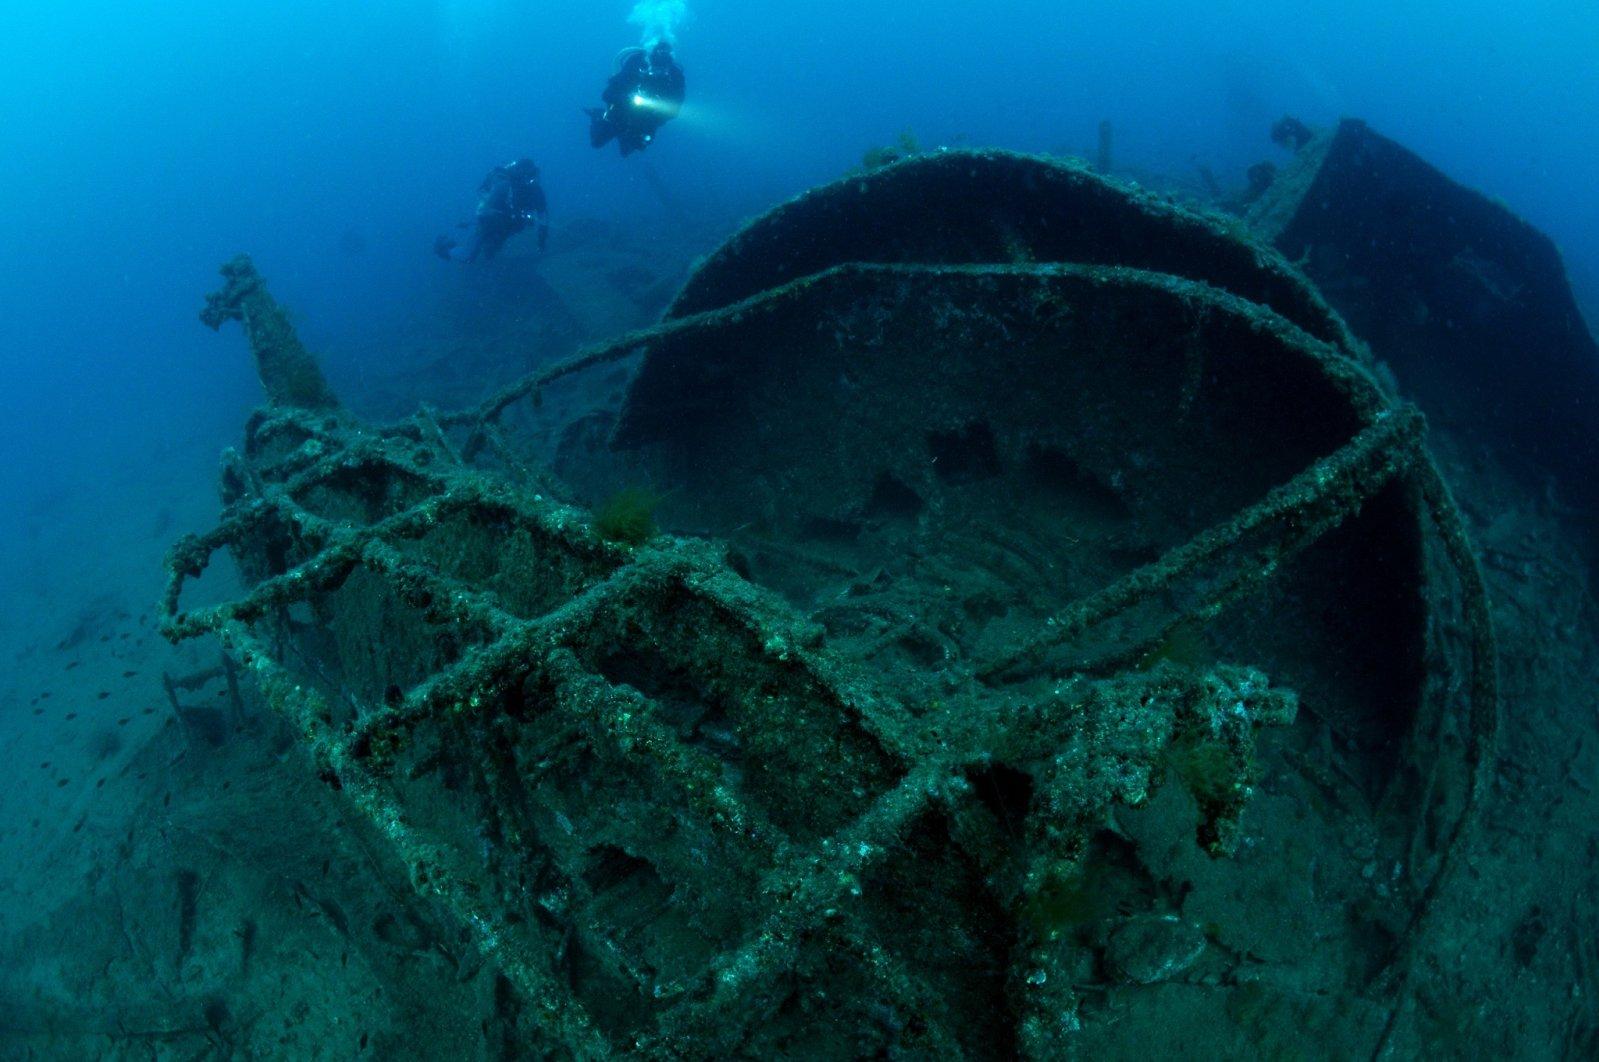 Wreckage of the HMS Majestic underwater, in Çanakkale, western Turkey, Oct. 30, 2020. (DHA Photo)